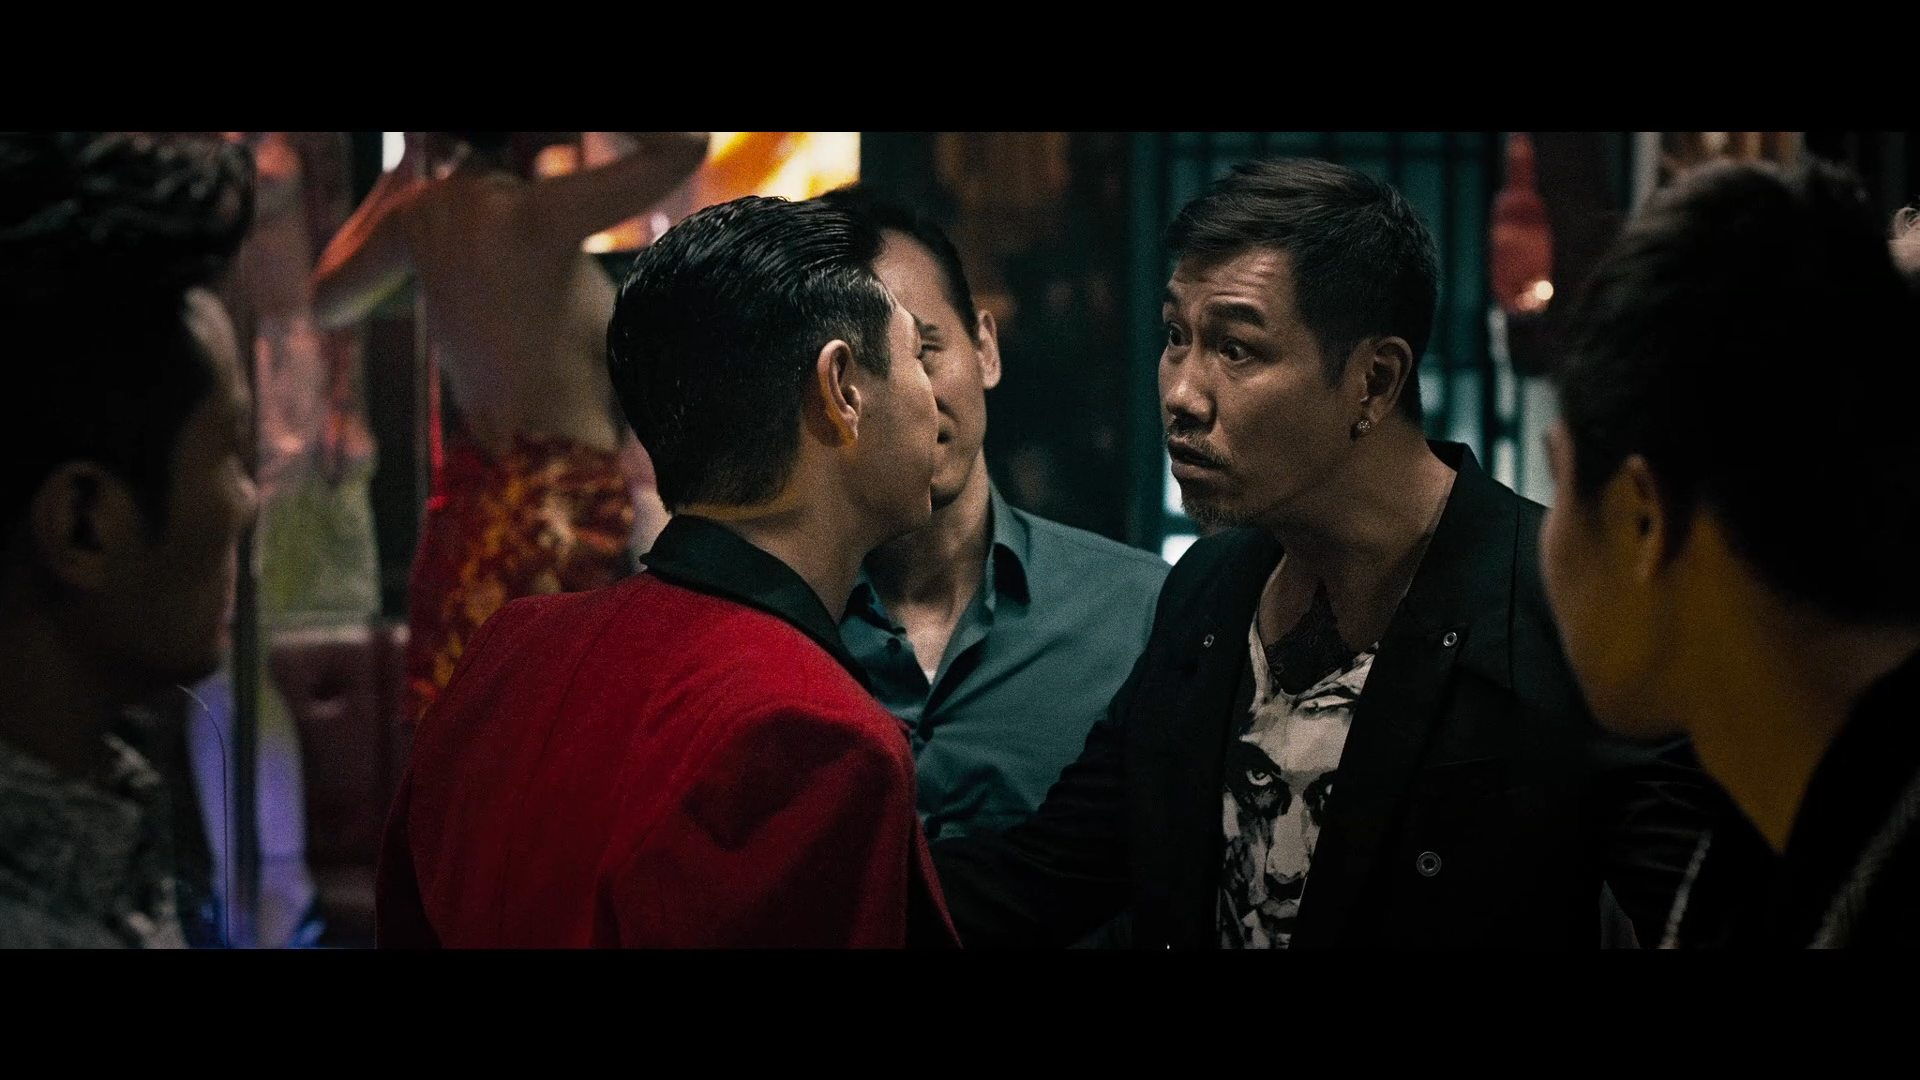 Филм азиатская мафия скачат